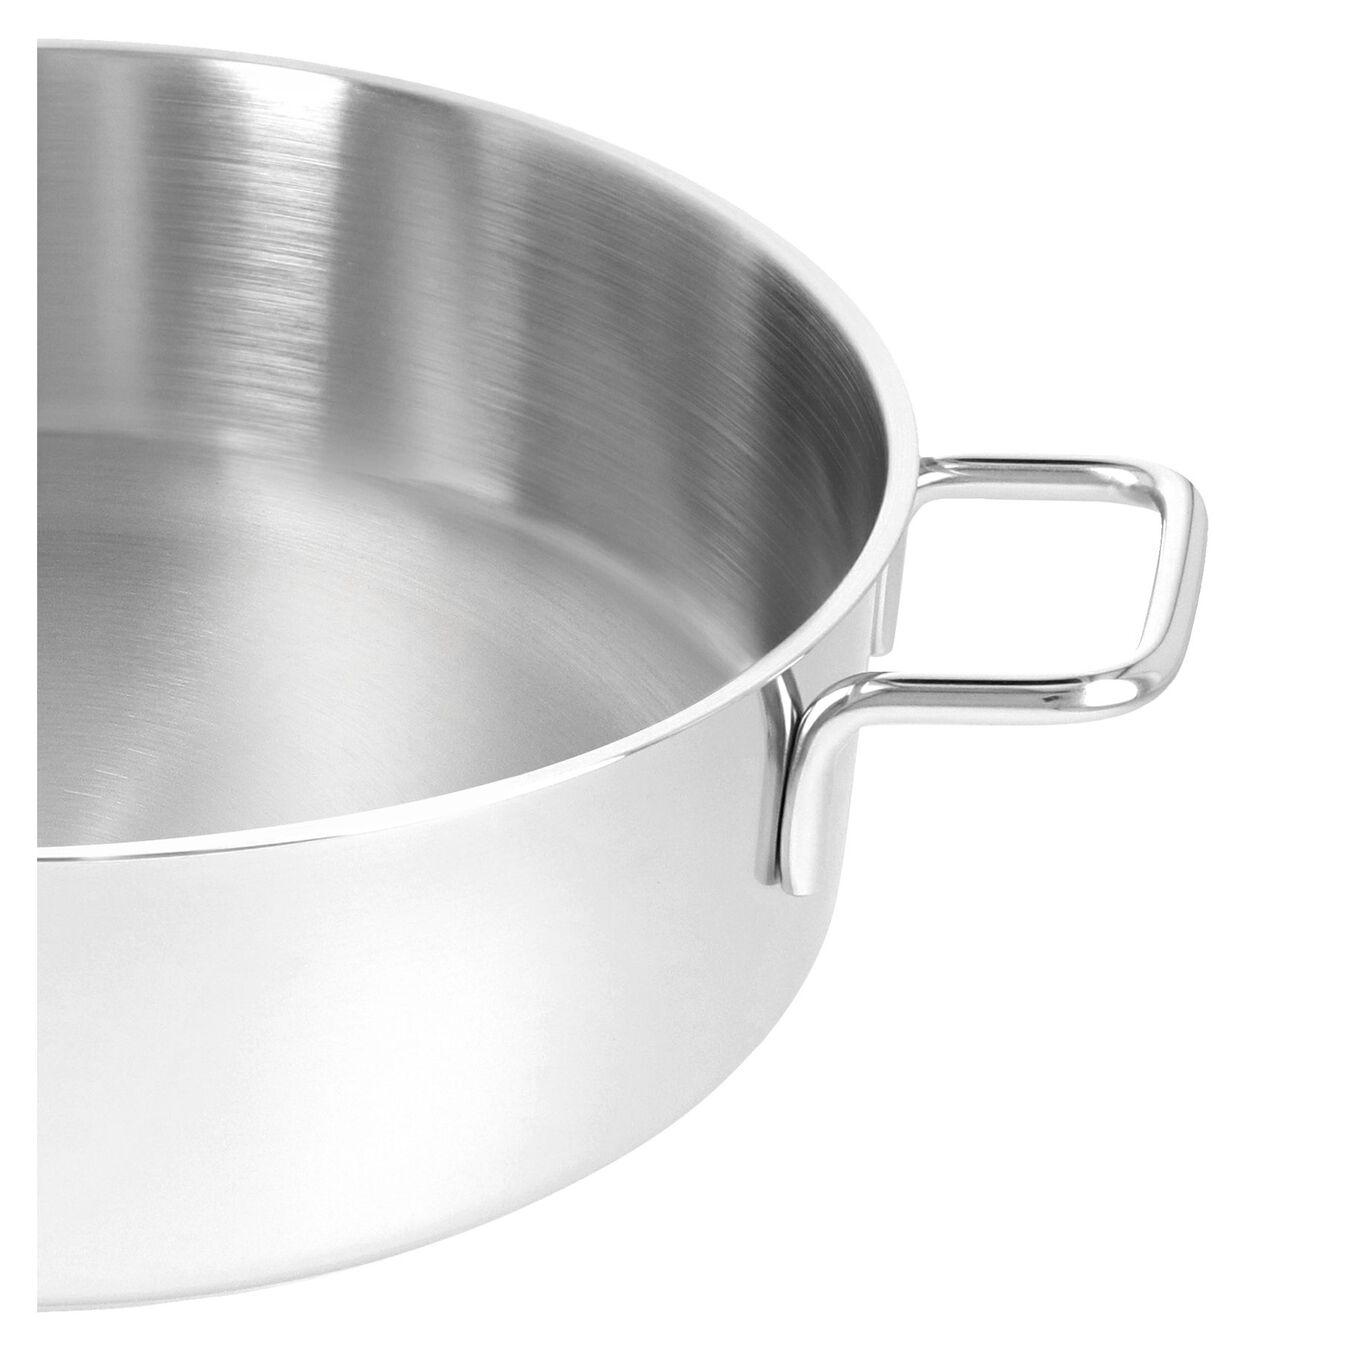 Kookpan met glazen deksel 24 cm / 2.8 l,,large 5